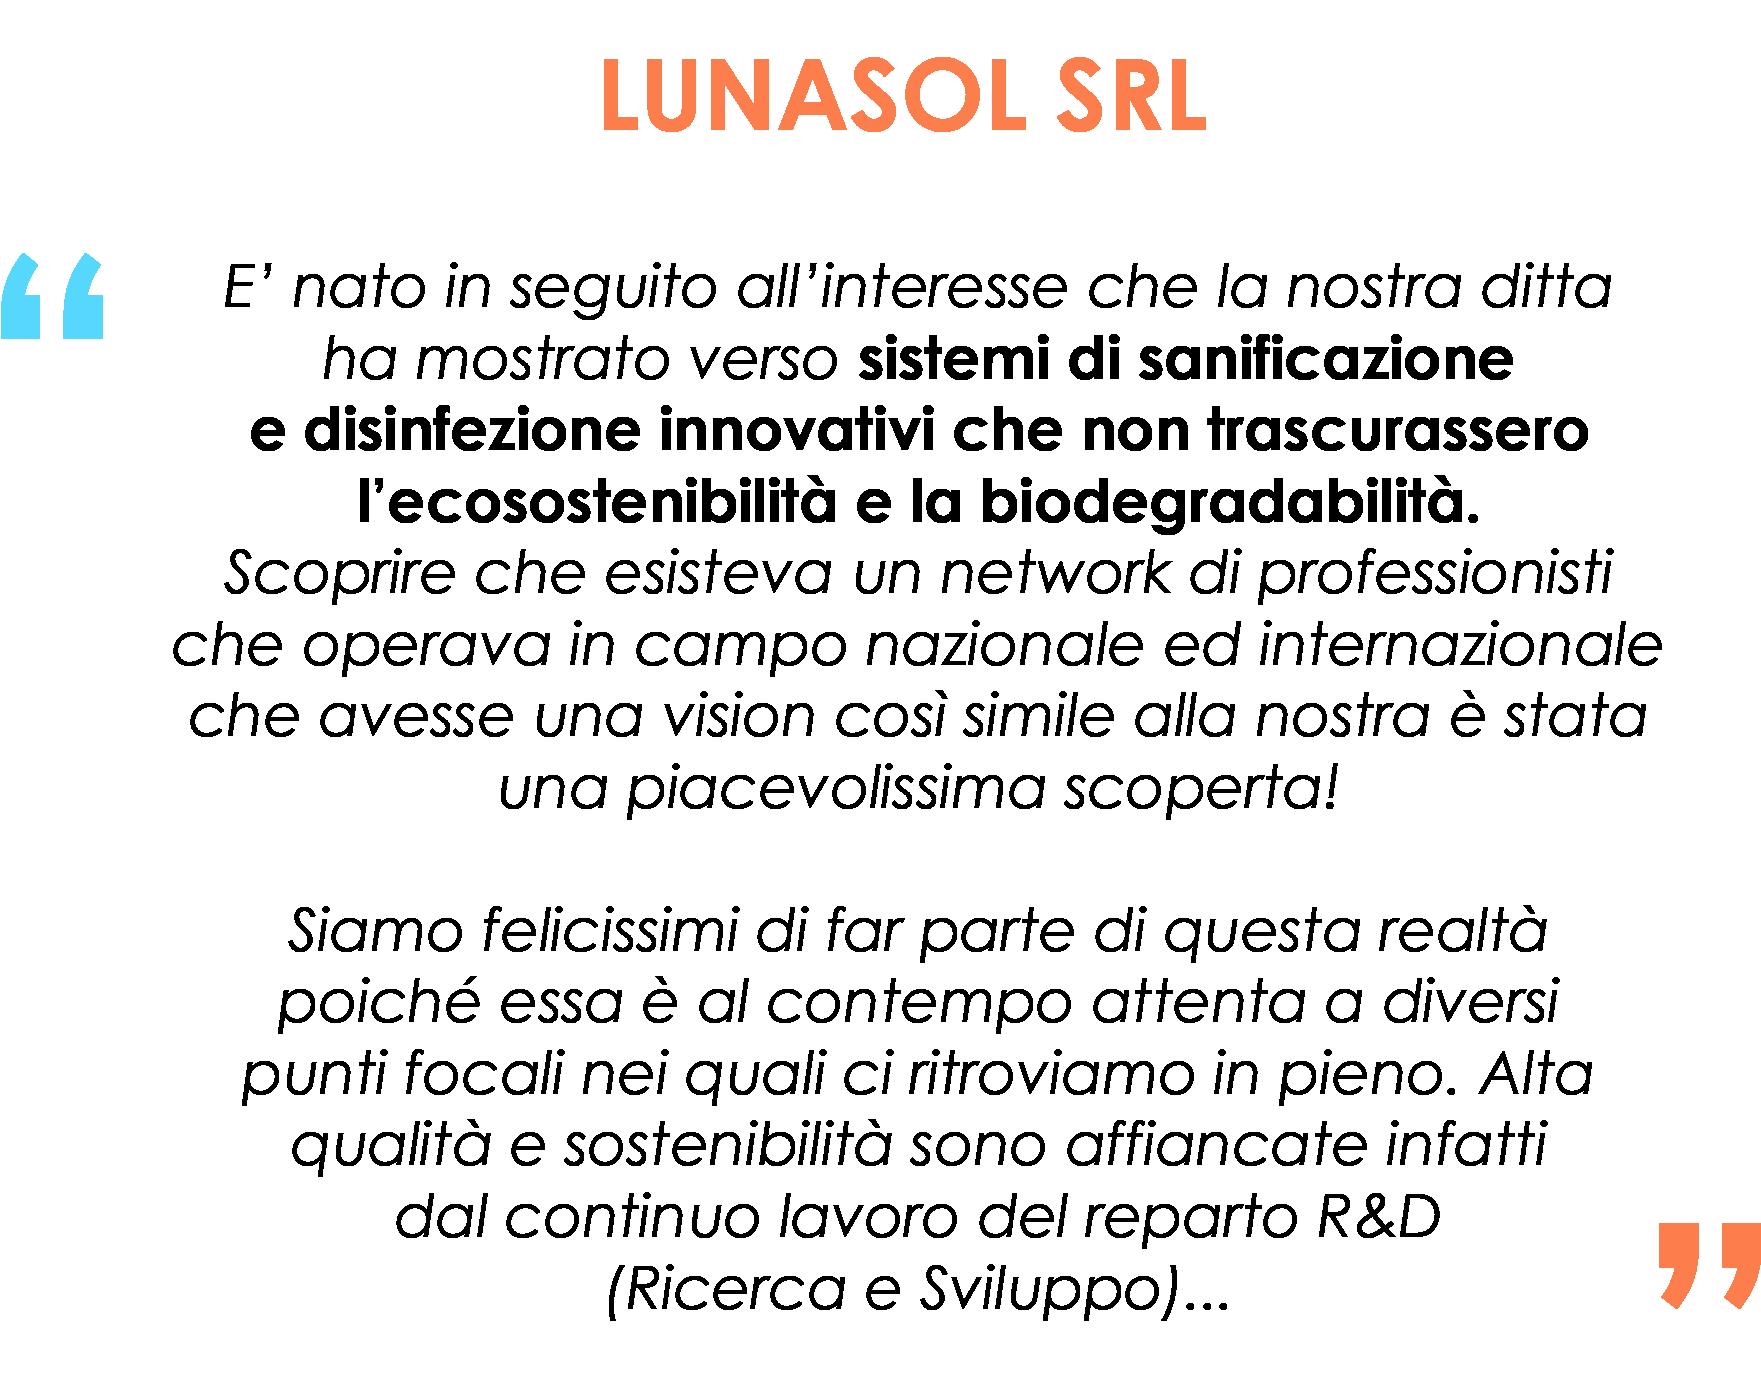 LUNASOL SRL copia